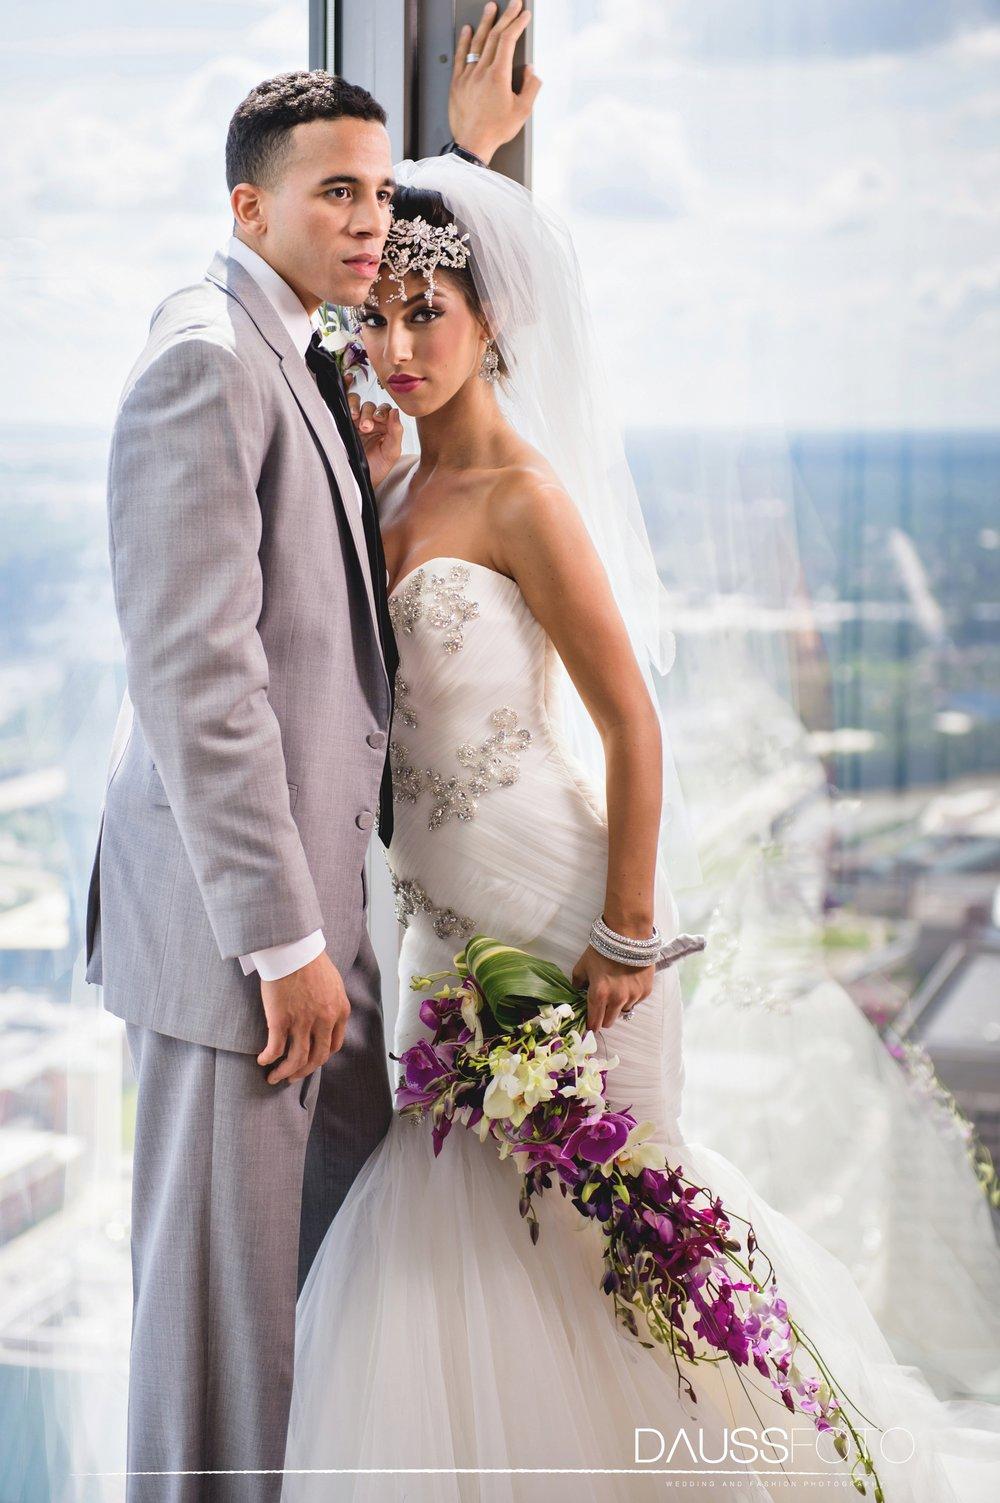 DaussFOTO_20150721_055_Indiana Wedding Photographer.jpg